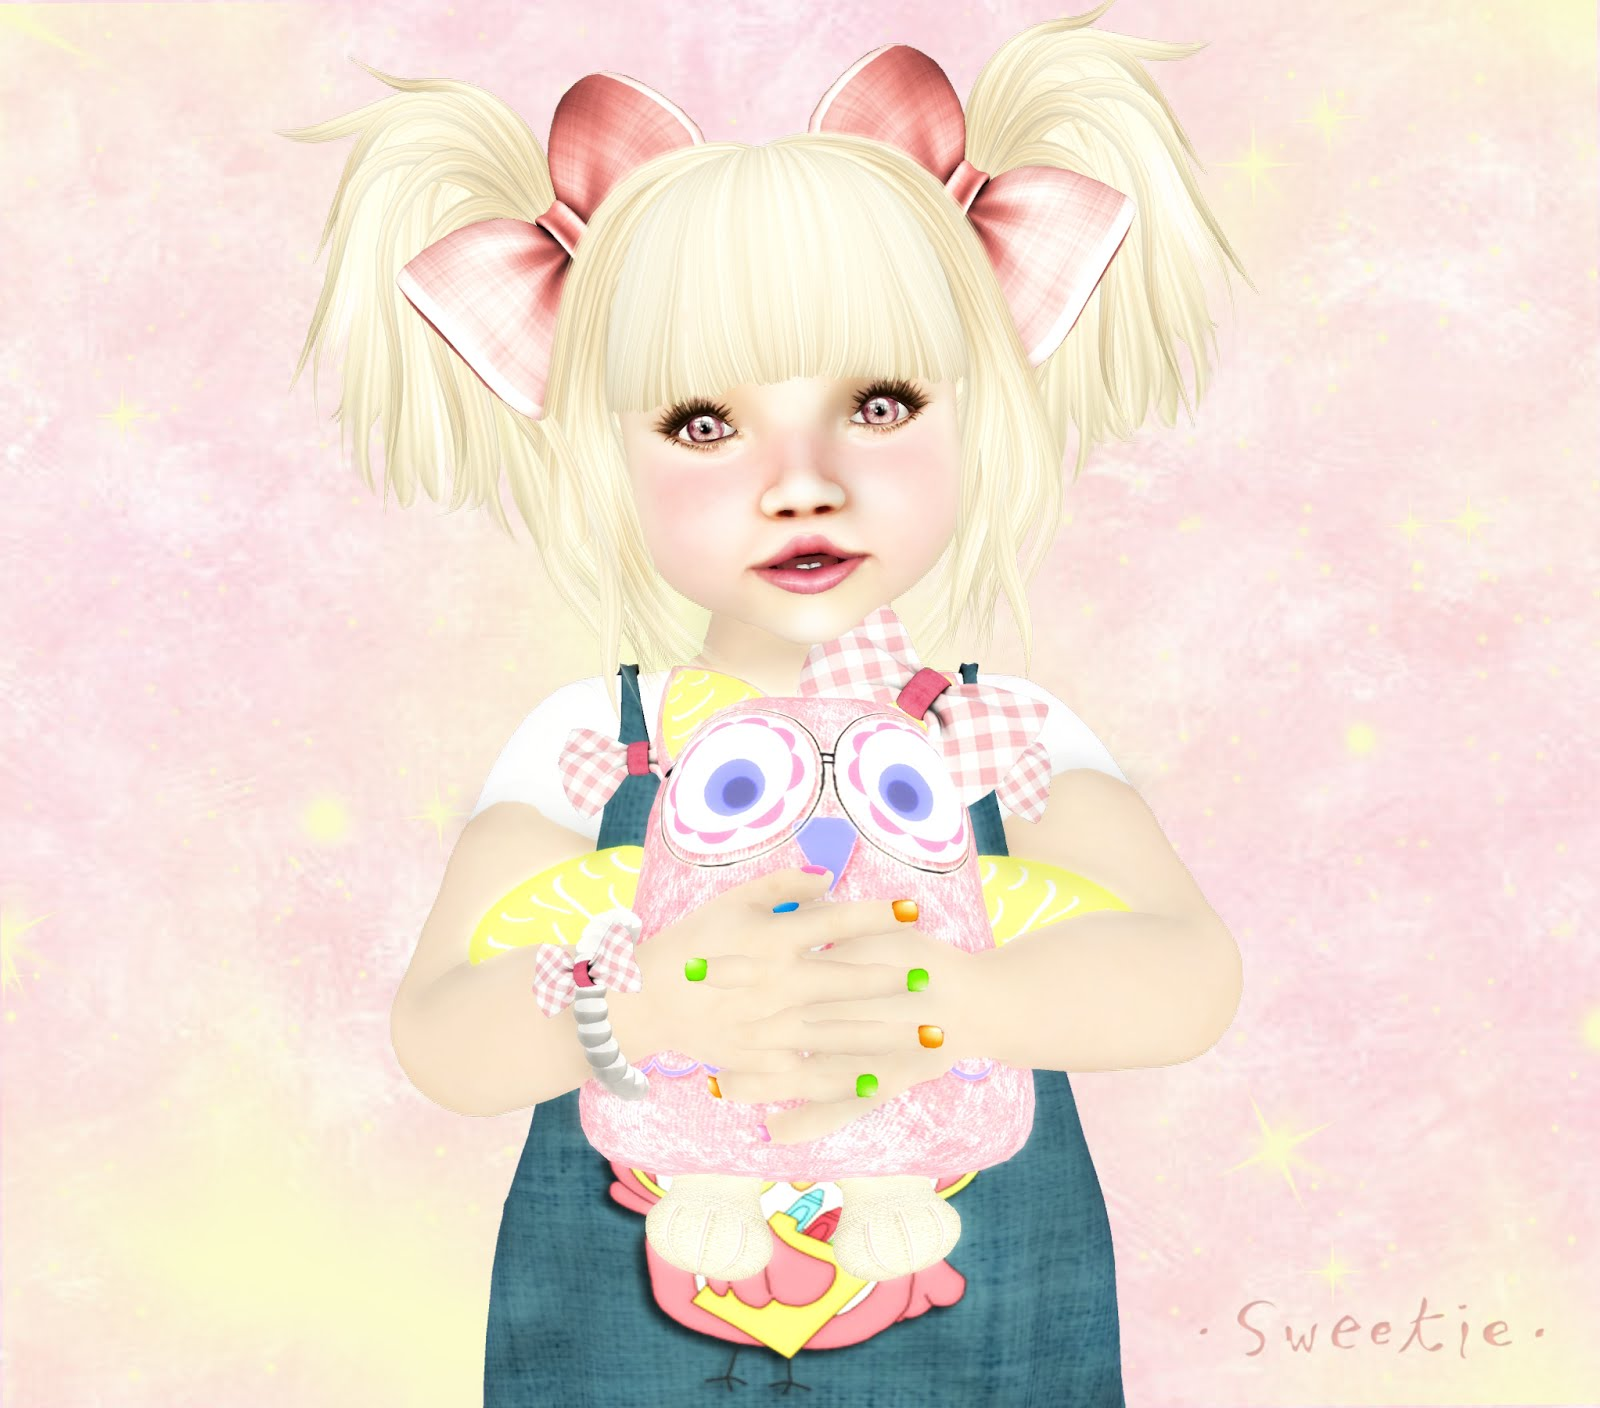 ToddleDoo BloGGer